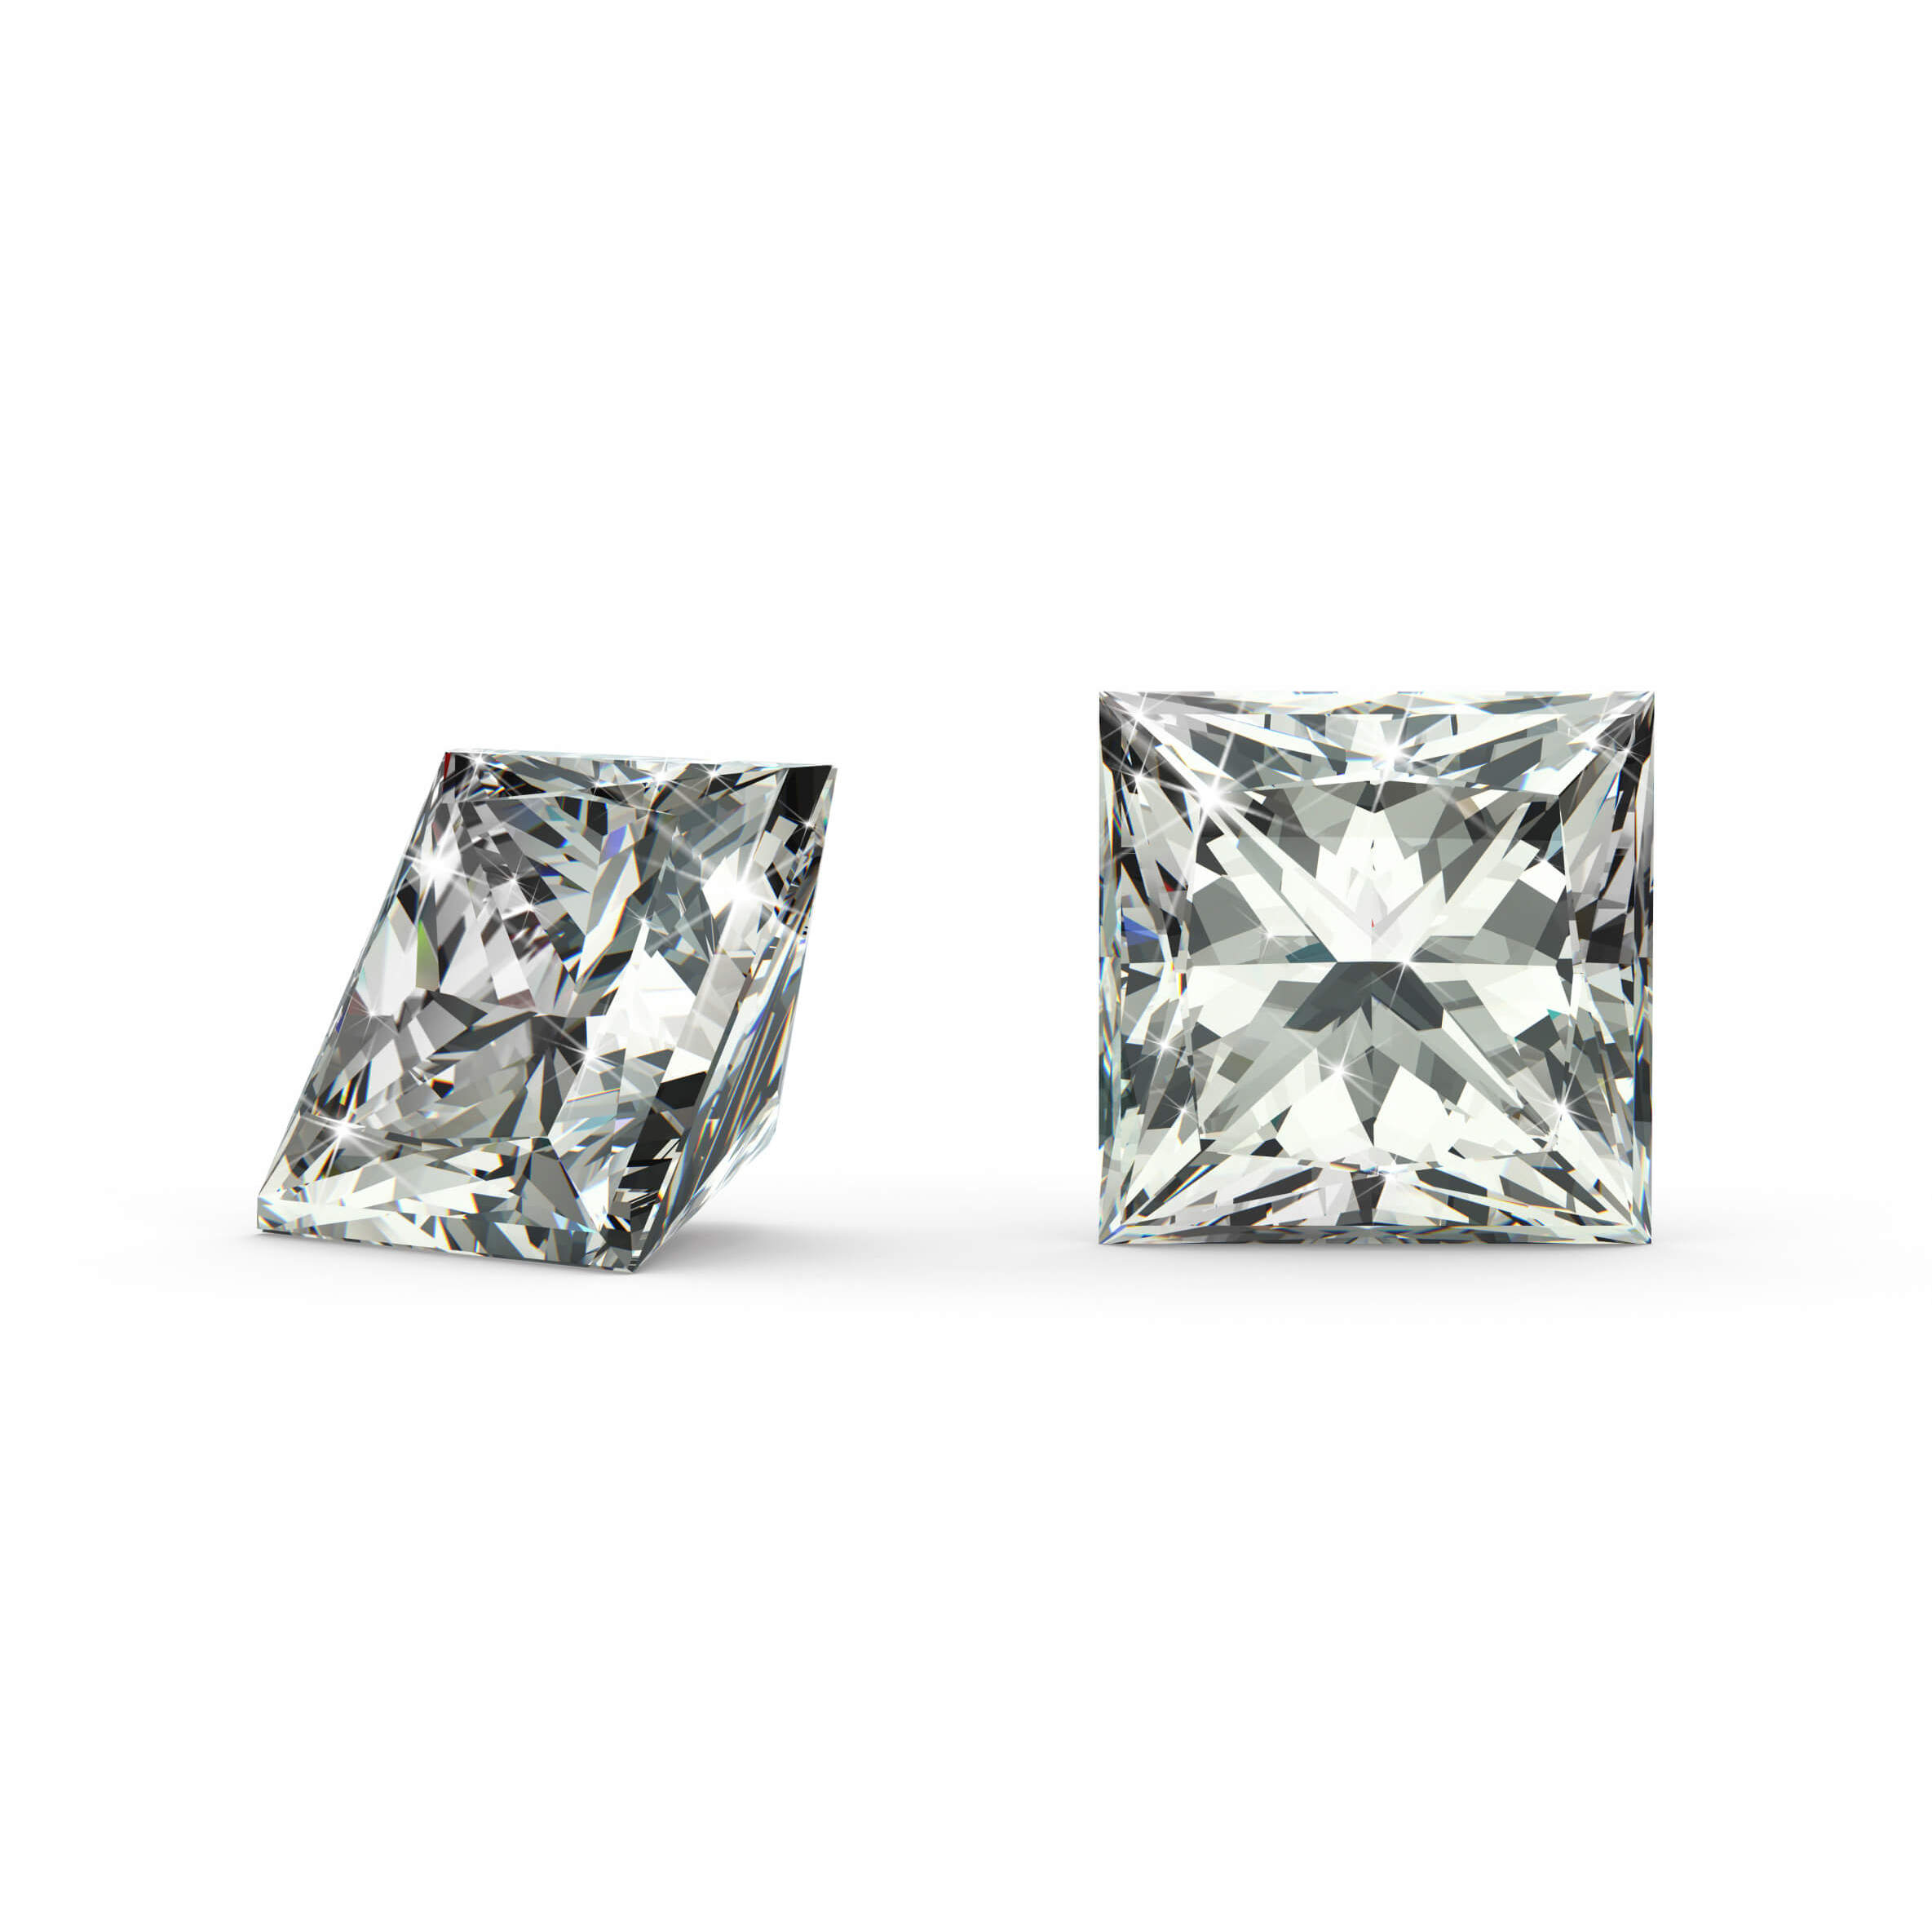 Crown Royal Jewelry & Loan